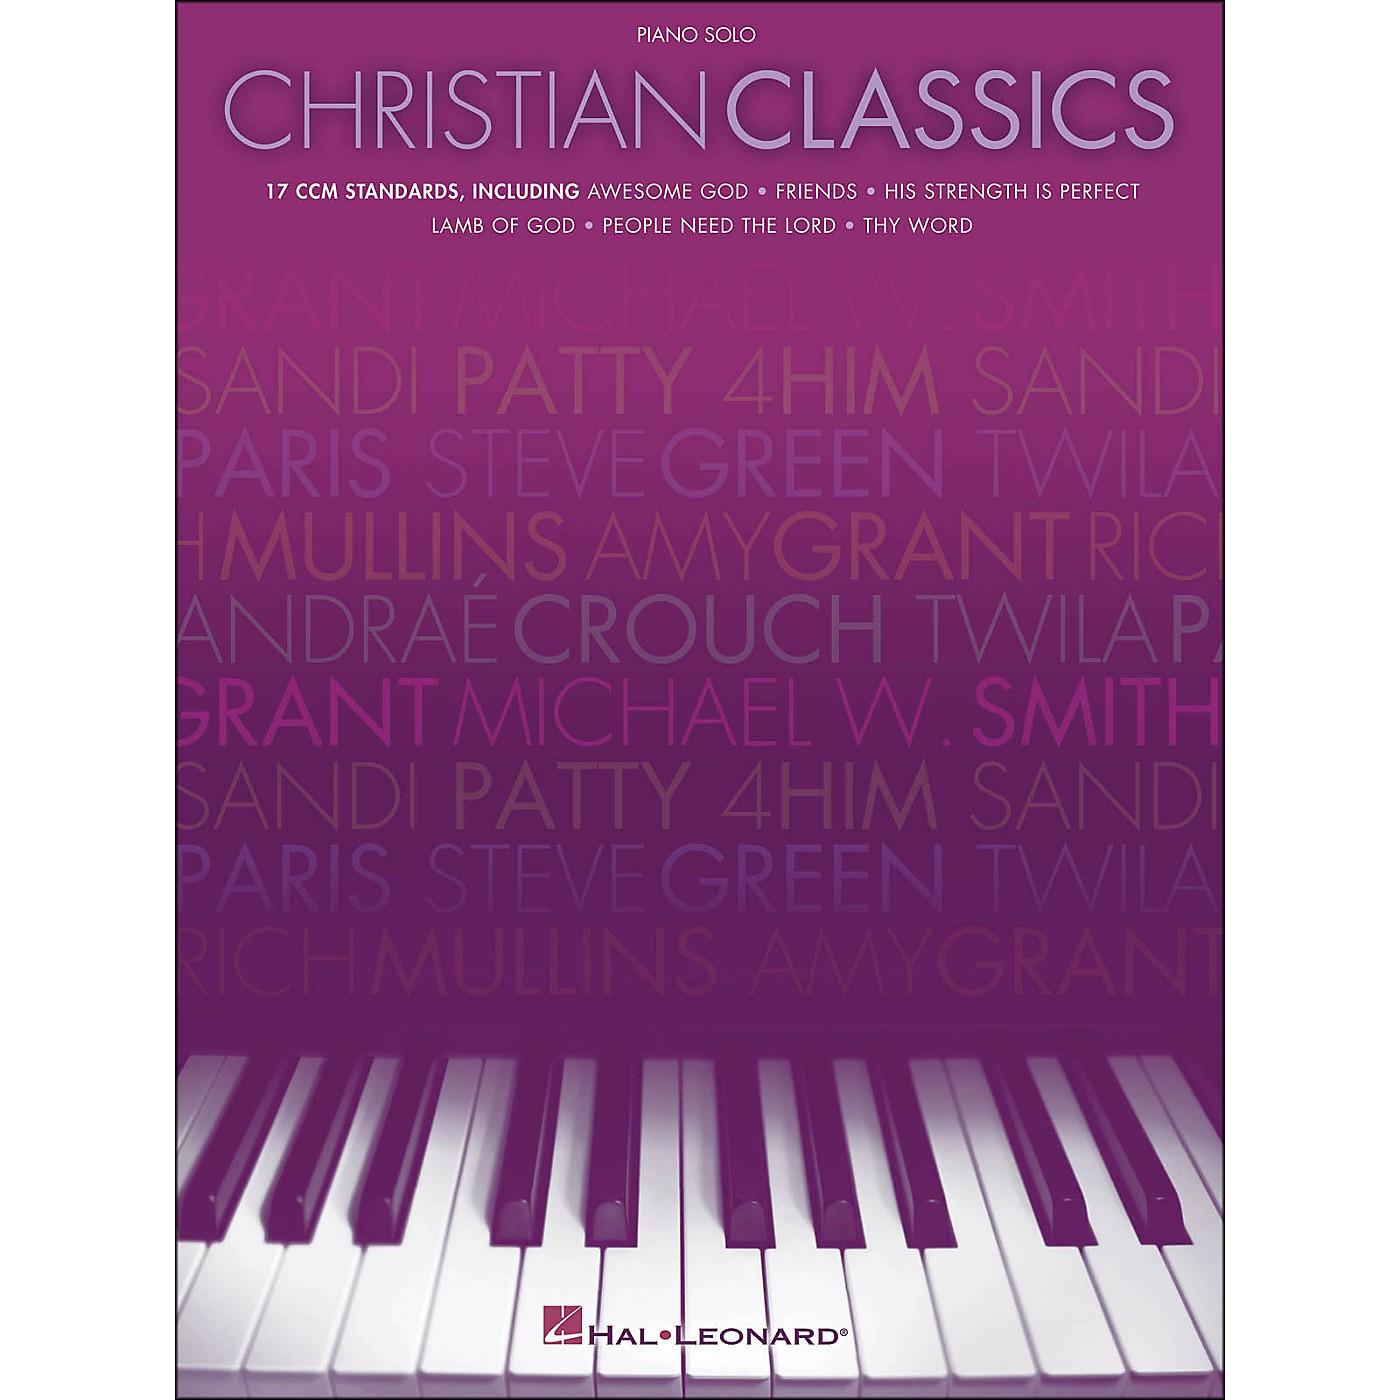 Hal Leonard Christian Classics Piano Solo thumbnail